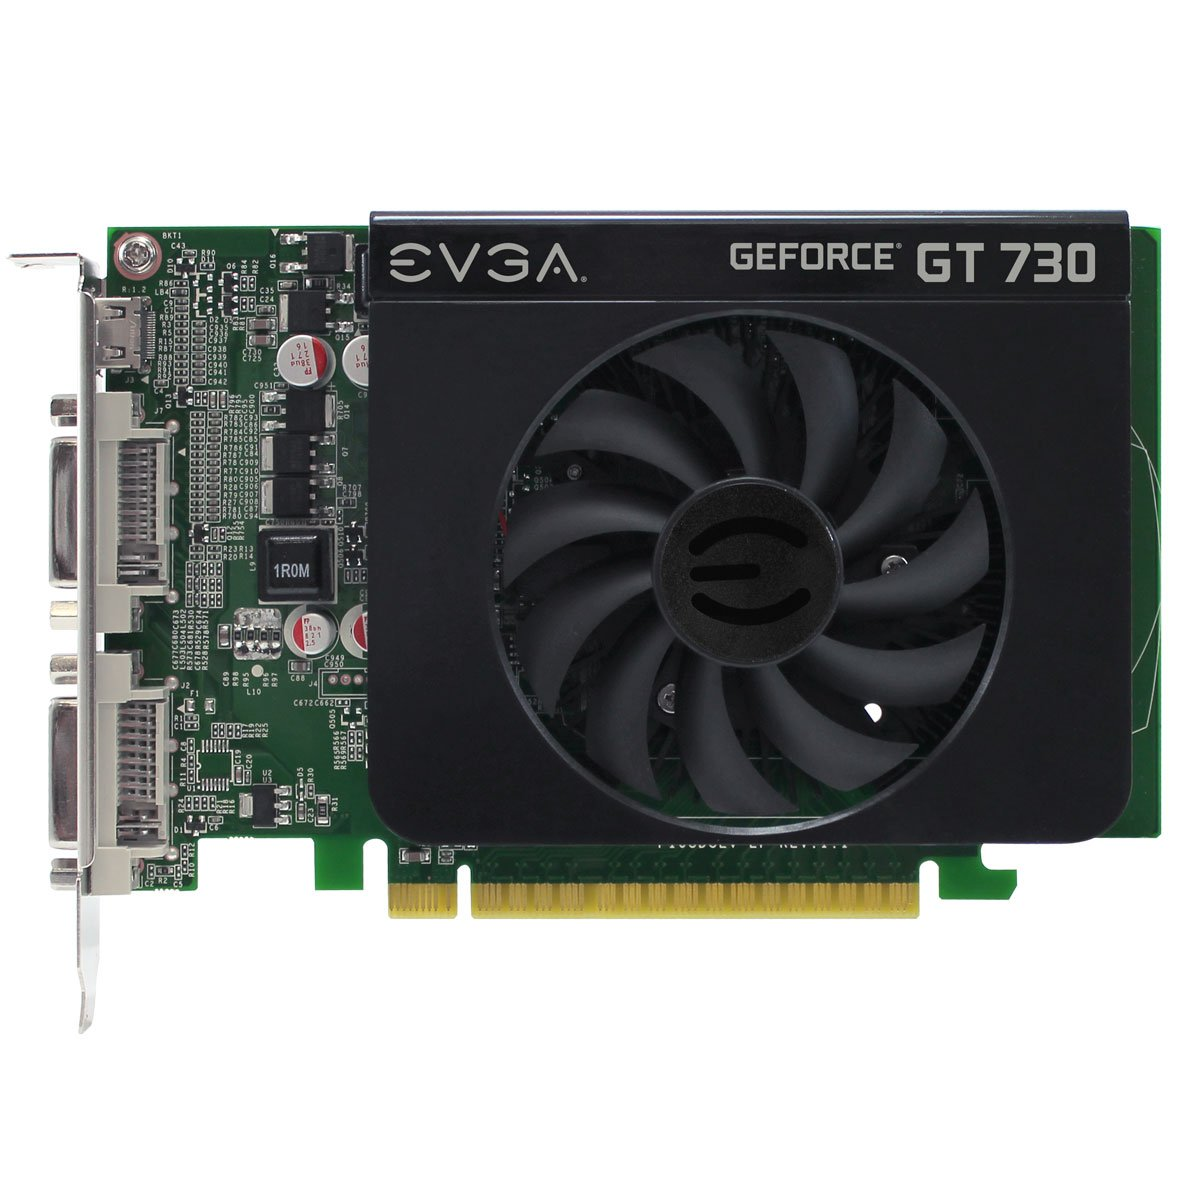 EVGA GeForce GT 730 4GB DDR3 128bit Dual DVI mHDMI Graphics Cards 04G-P3-2739-KR